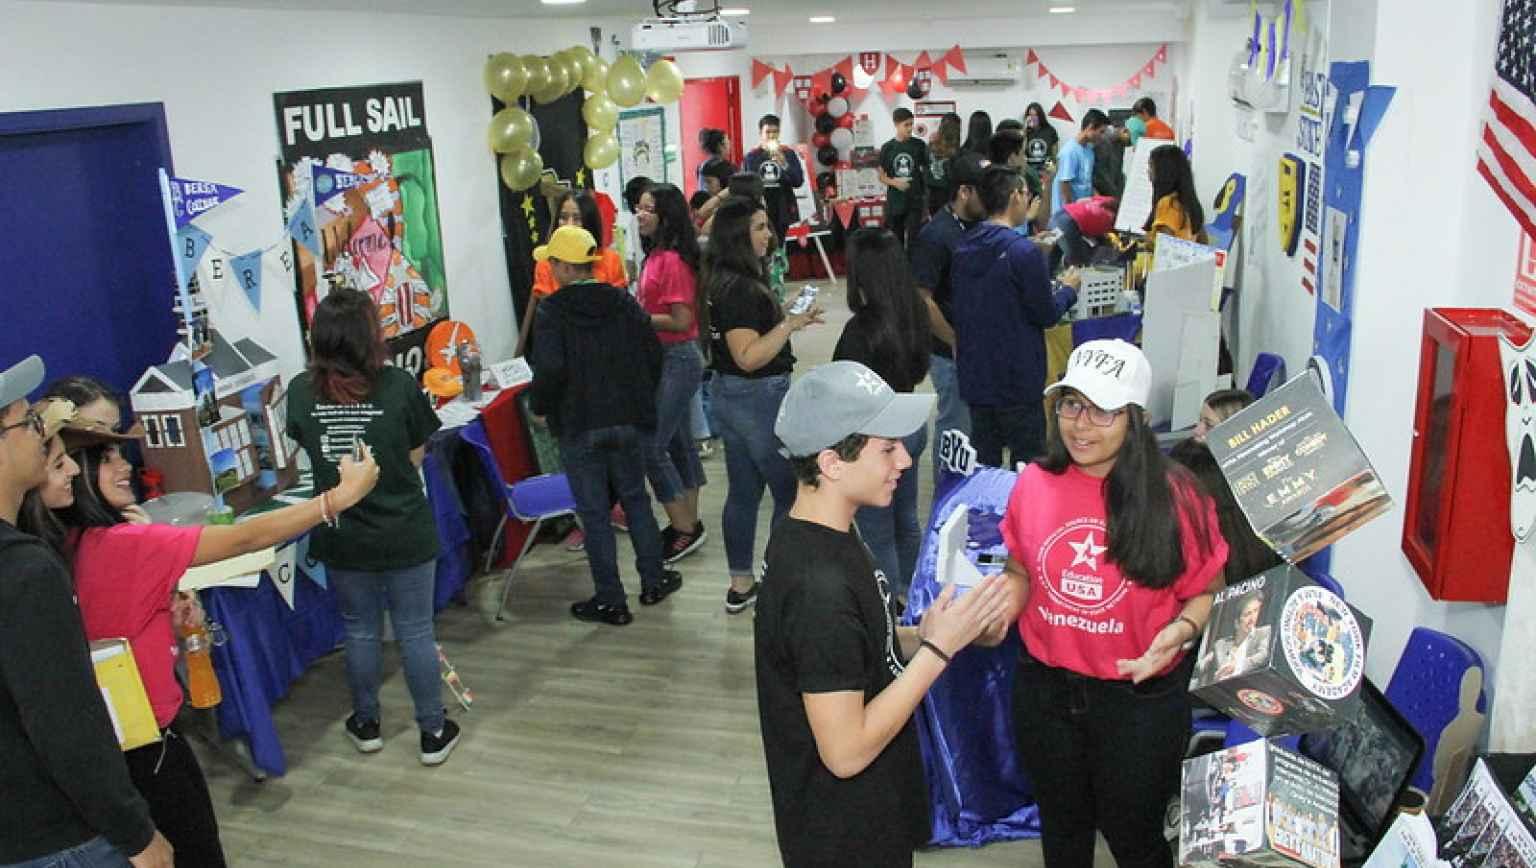 International students representing US HEIs at EducationUSA Mock College Fair